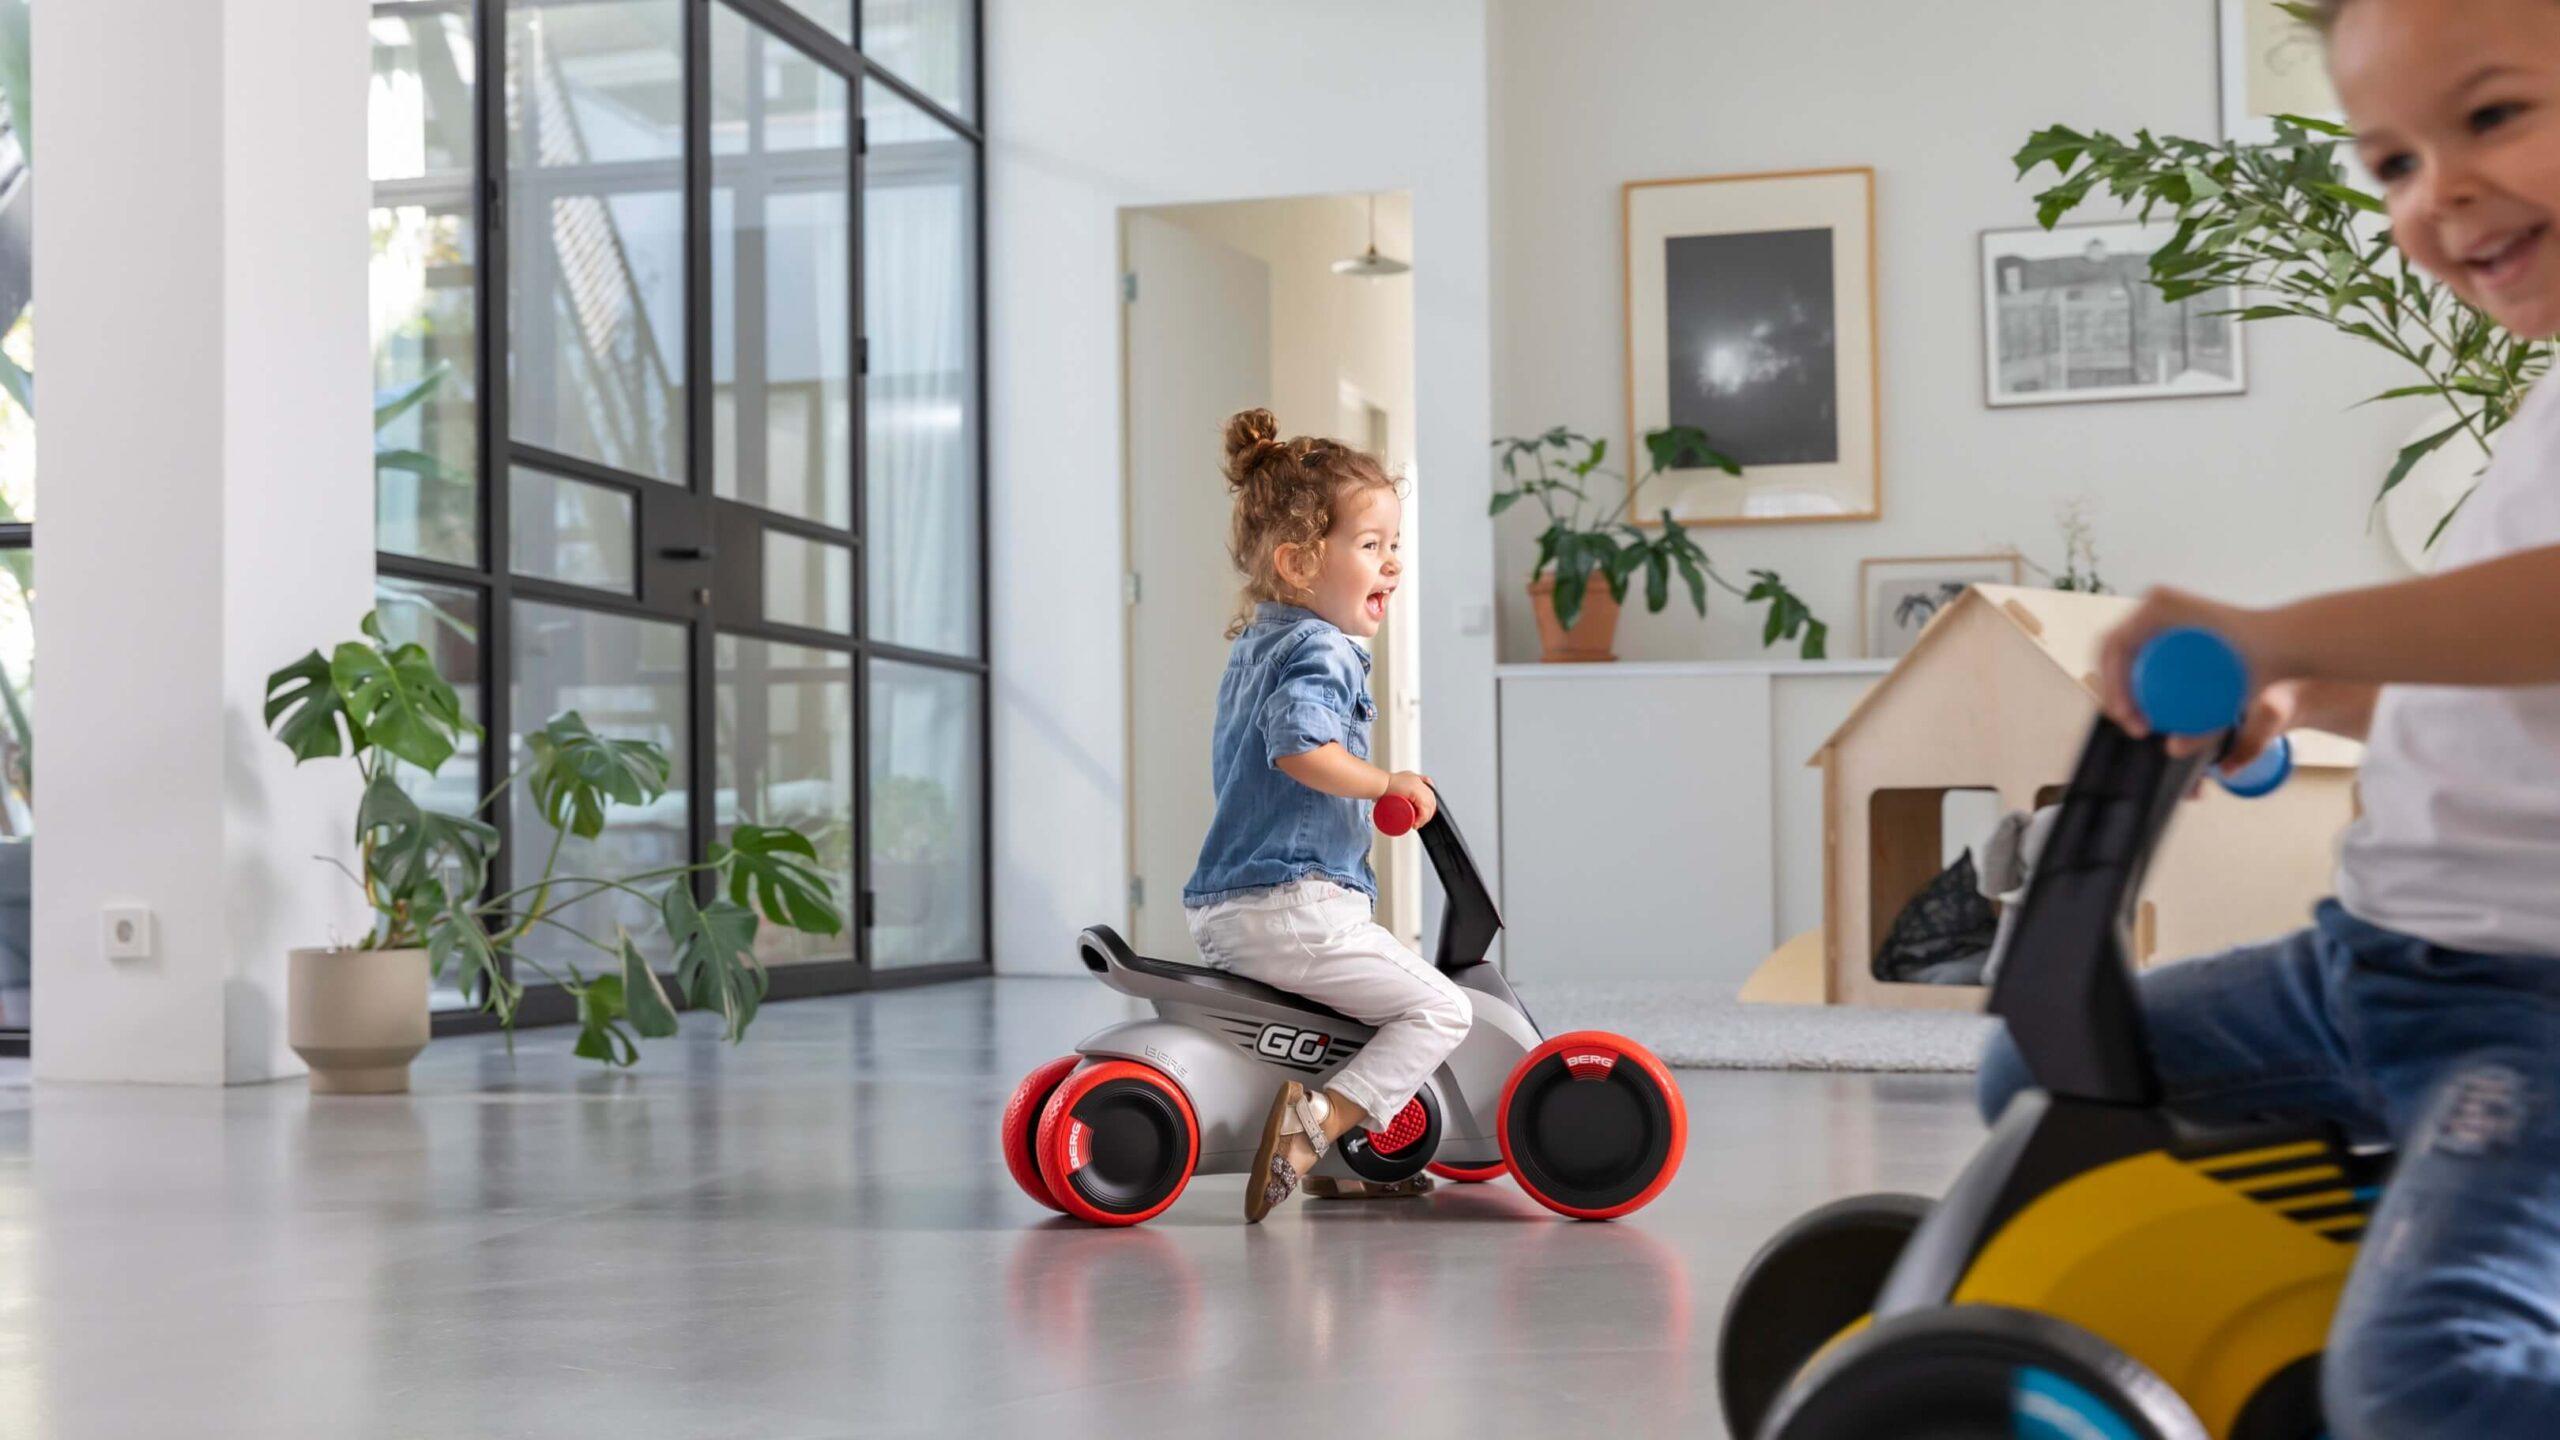 Berg Toys, Berg, skelter, gocar, trampoline, Jurjen Poeles Fotografie, lifestyle, speelgoed, kinderen, kids, fun, toys